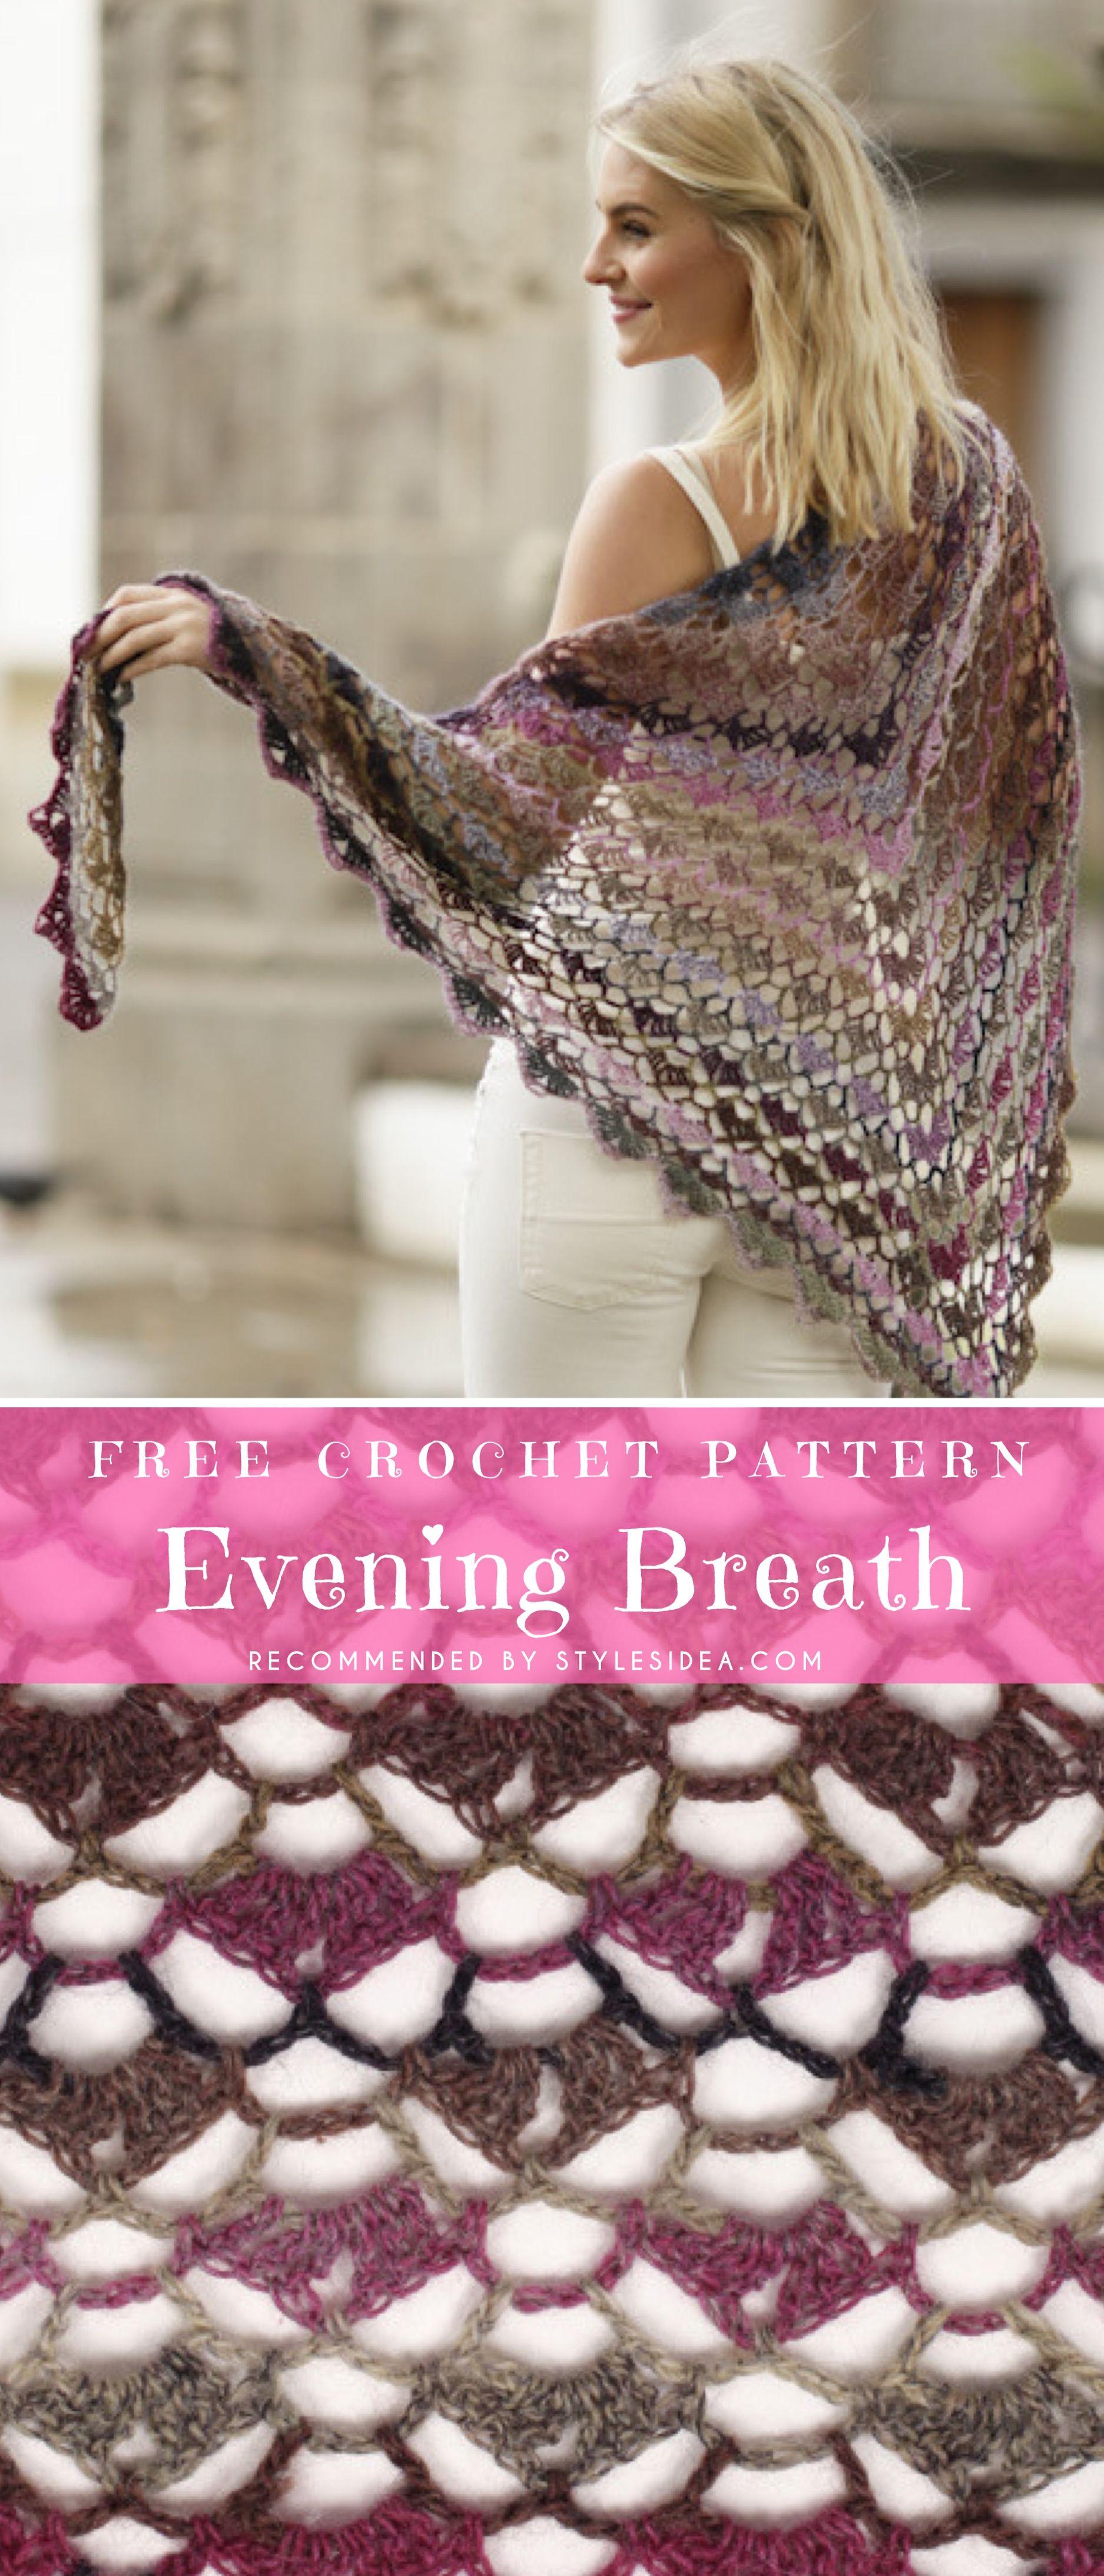 Stunning Evening Shawls Free Crochet Pattern | Pinterest | Evening ...